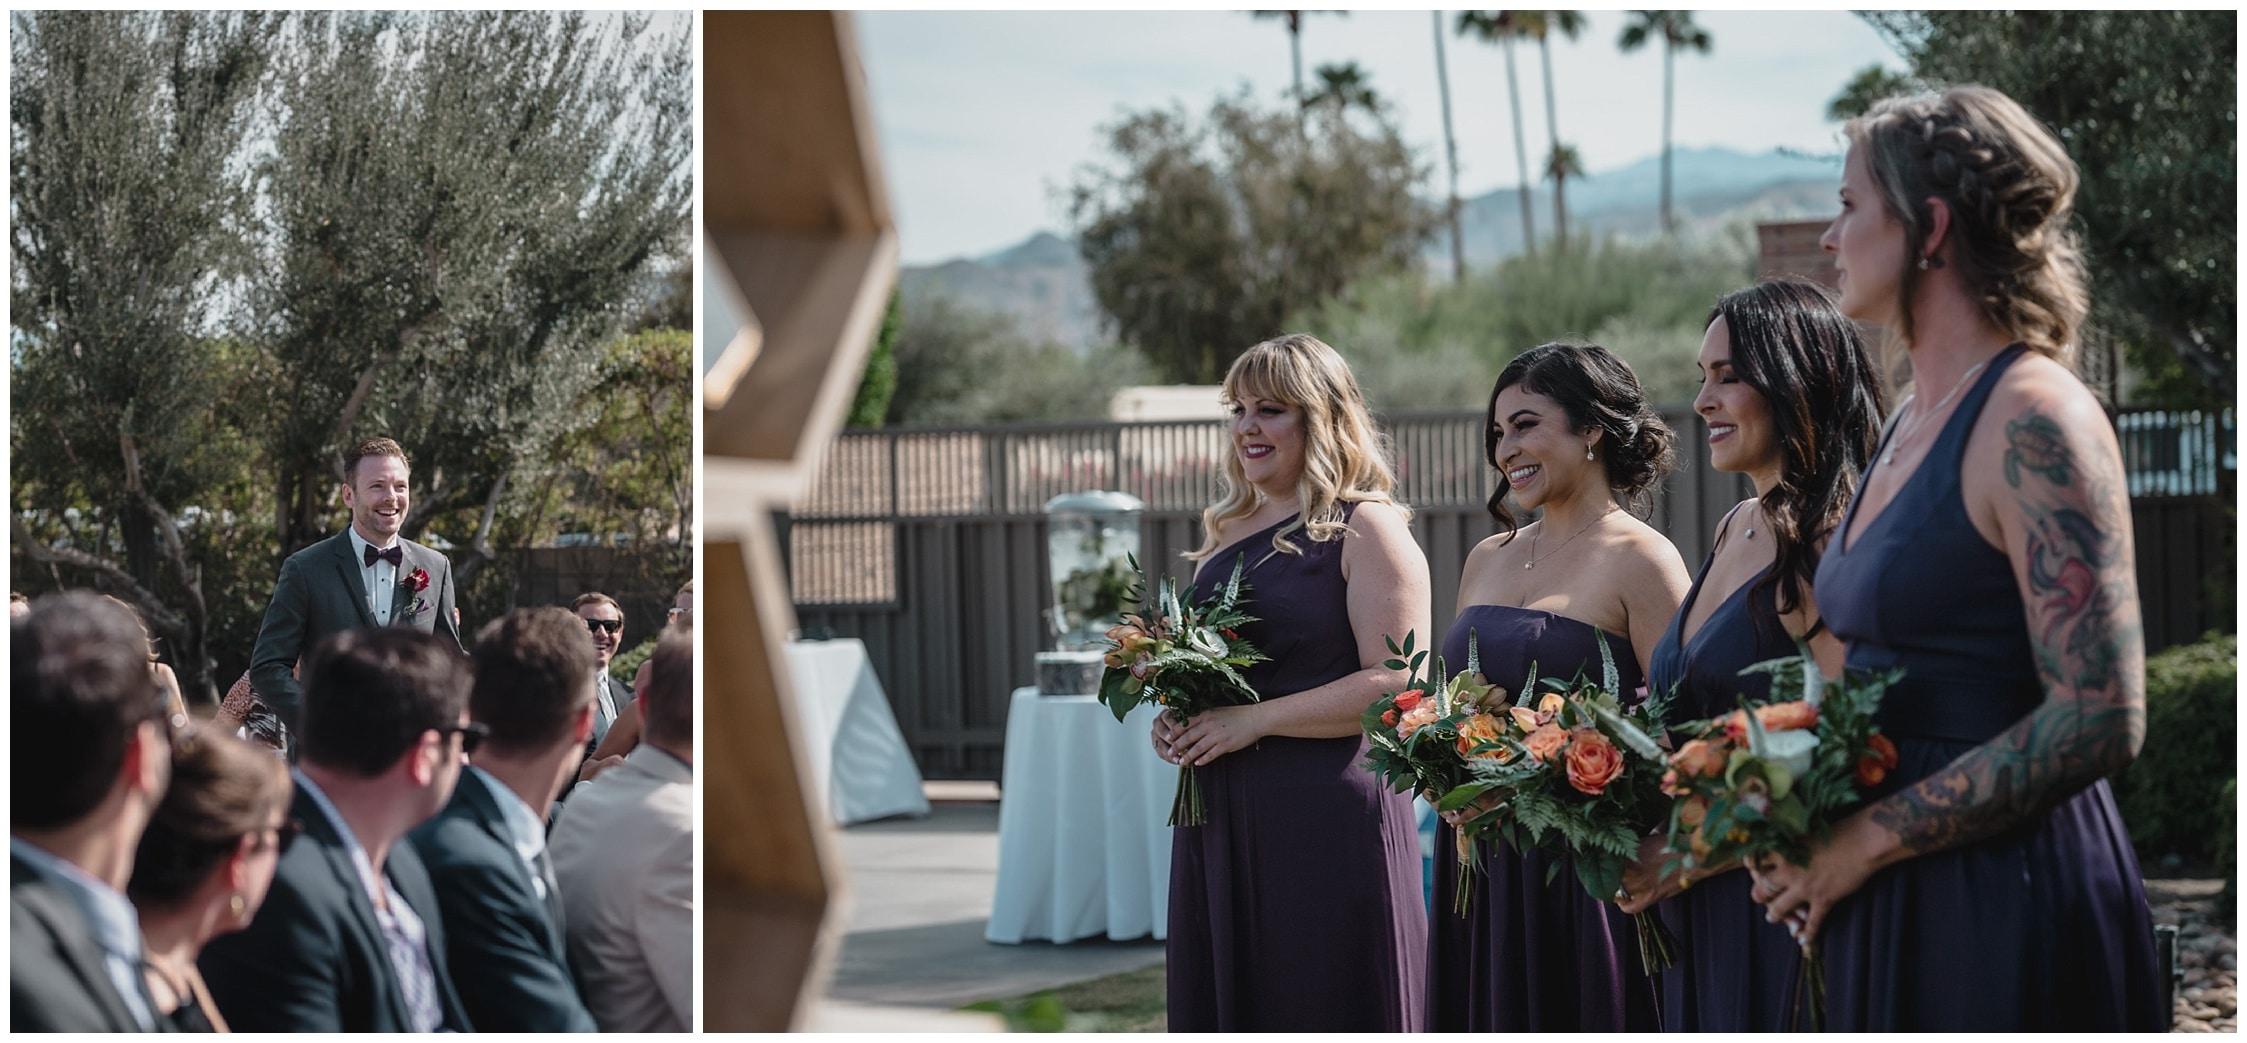 Wedding at Twin Palms Sinatra Estate with Karen & James 71